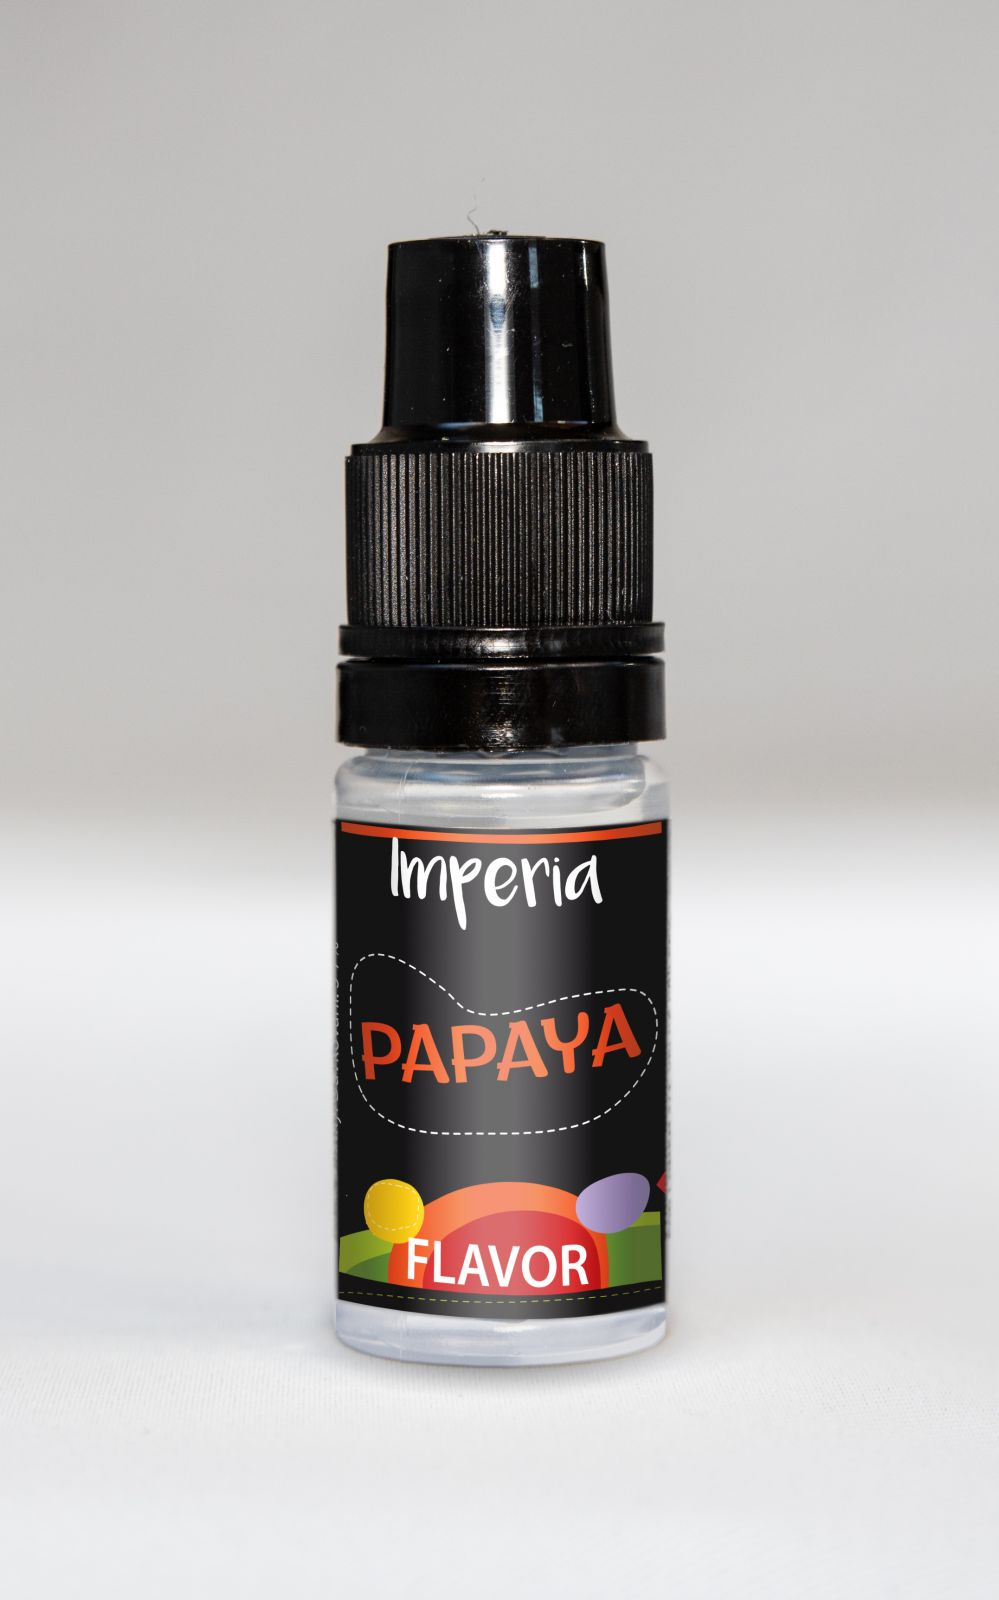 PAPAYA - Aróma Imperia Black Label Boudoir Samadhi s.r.o.